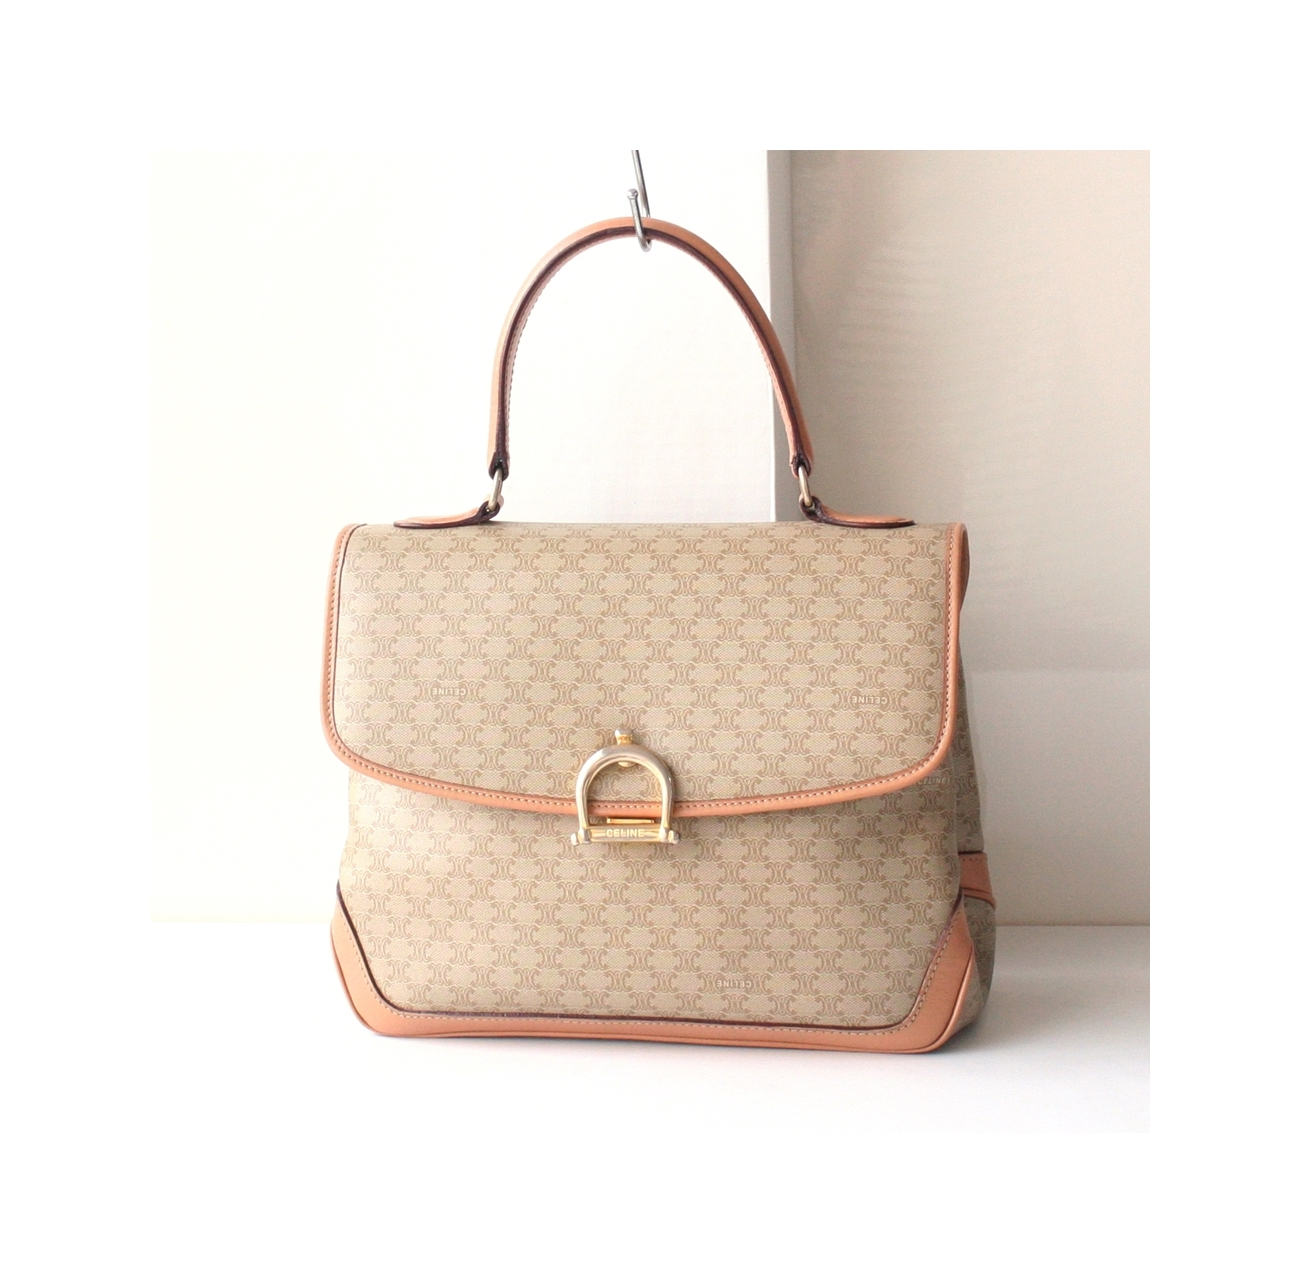 Celine Bag monogram authentic vintage tote handbag on Storenvy c8602228bb08c